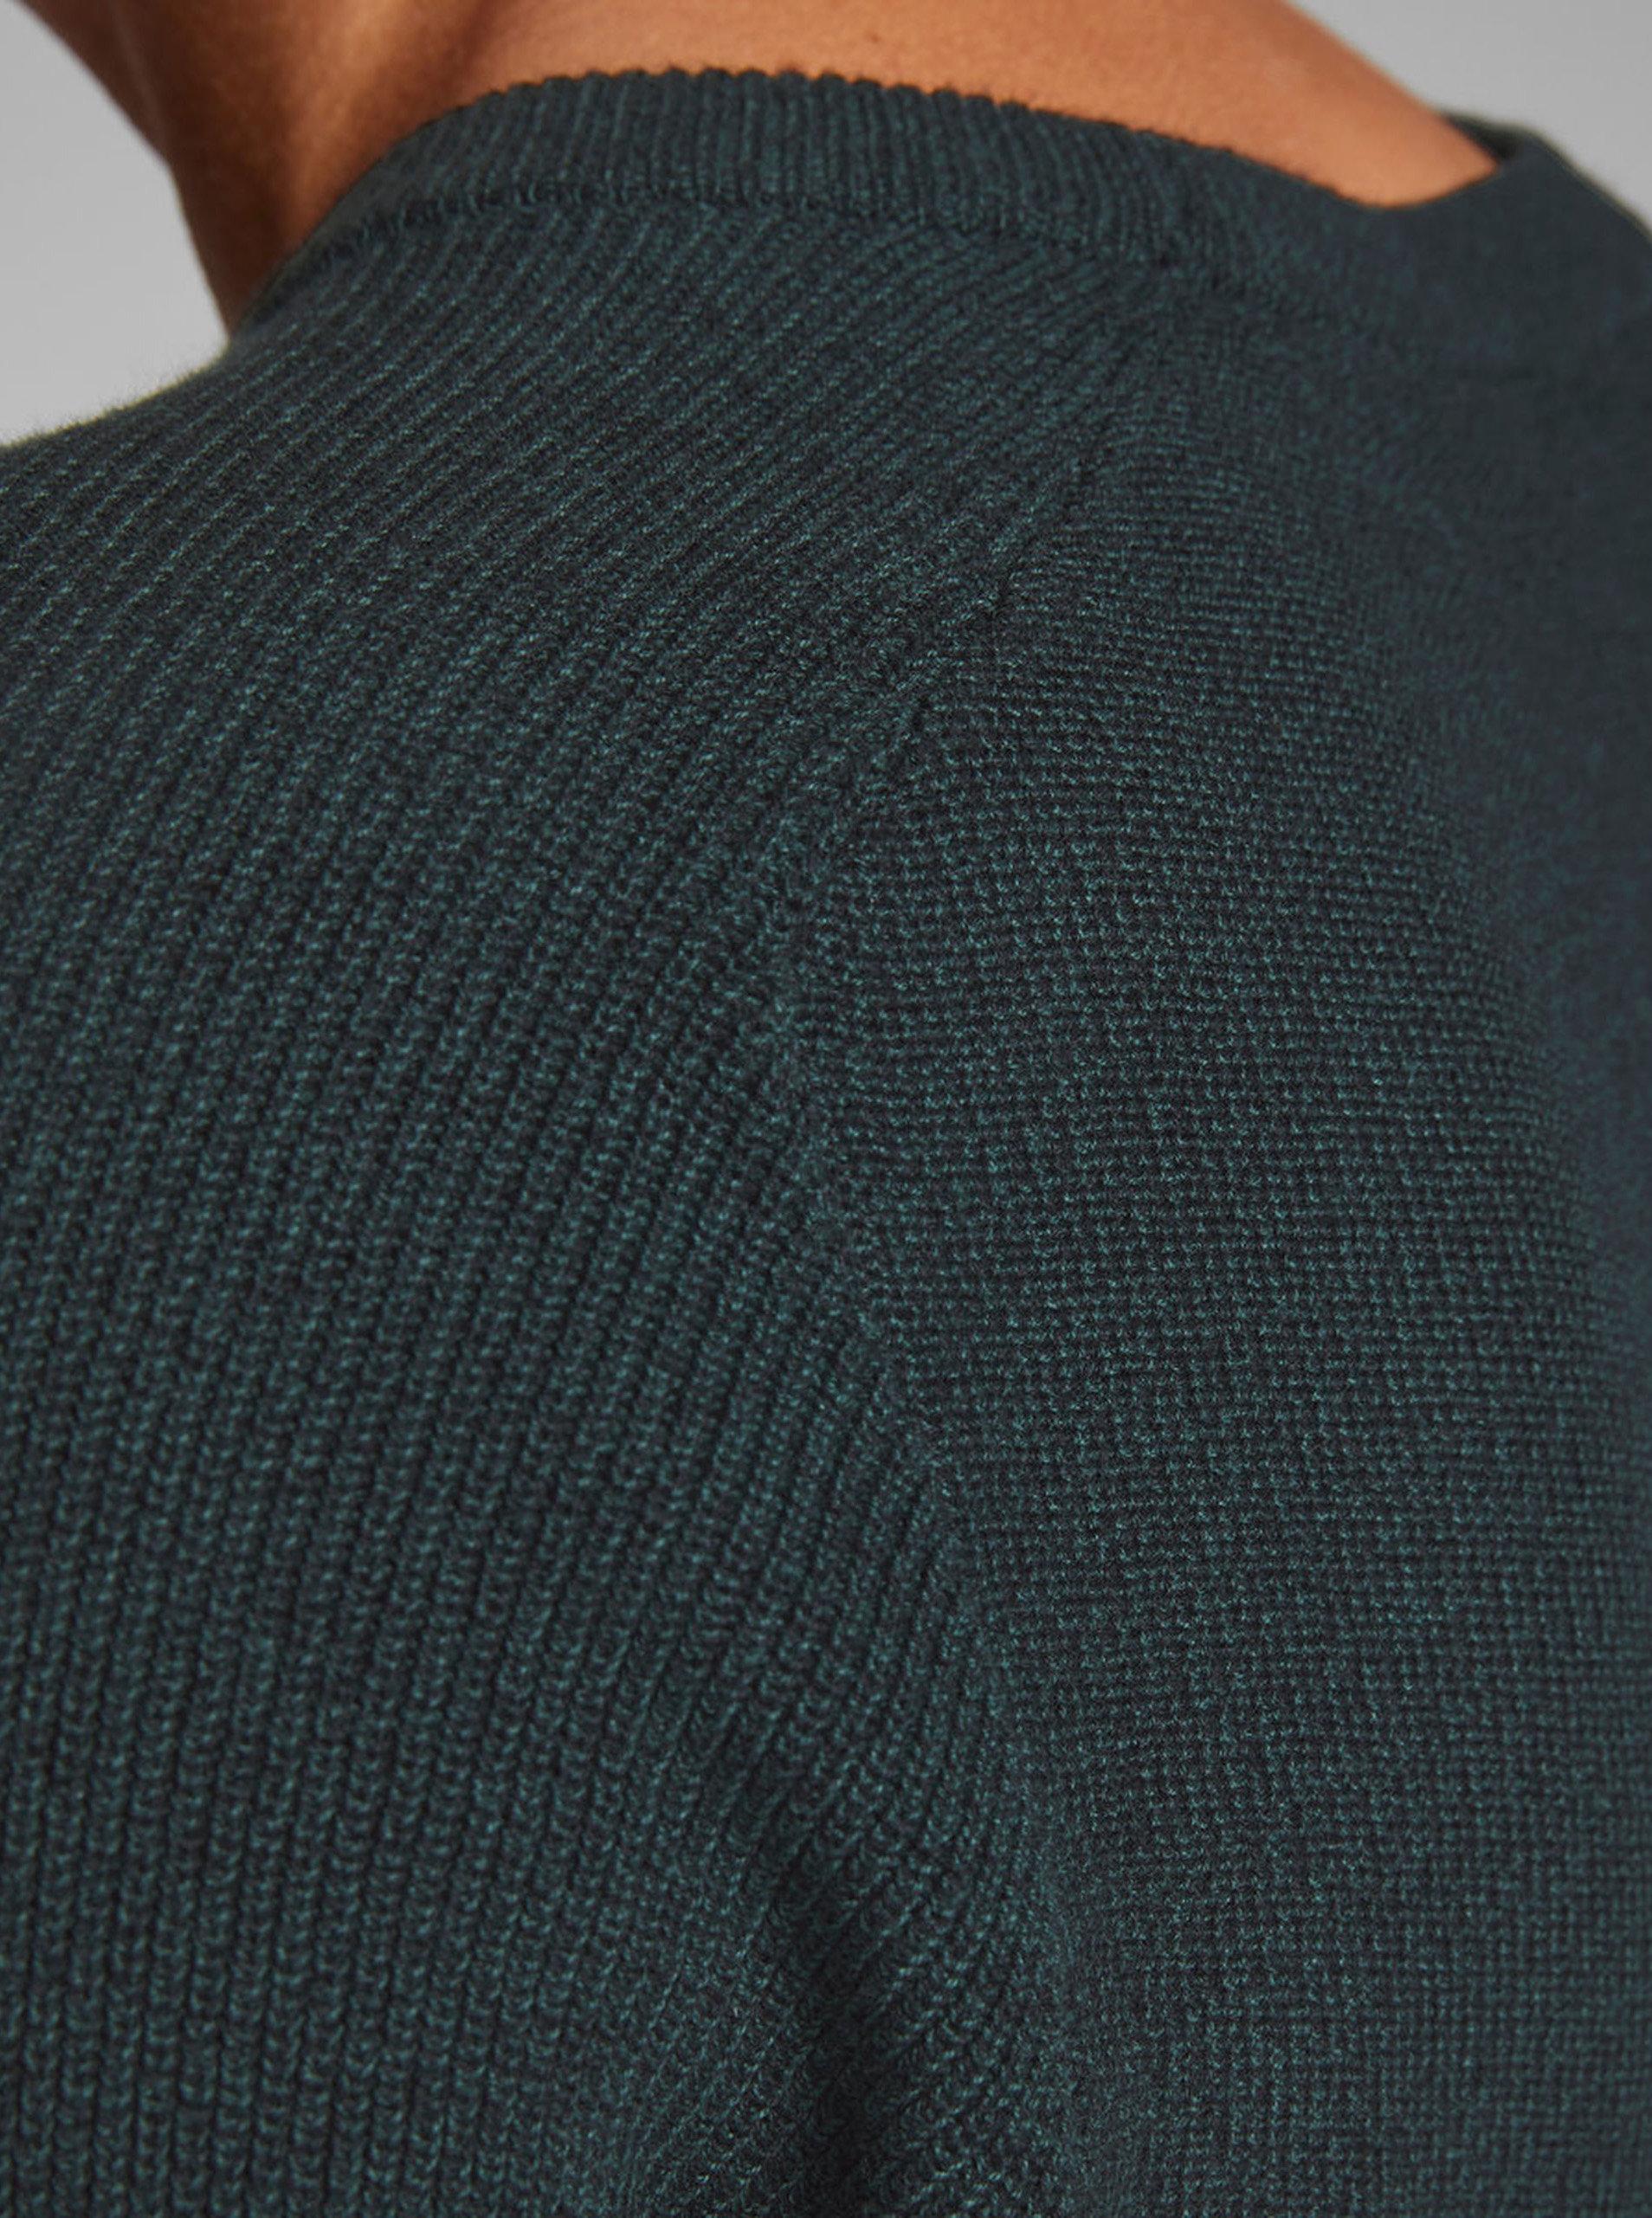 bb90aa564168 Tmavozelený melírovaný sveter Jack   Jones Maine ...